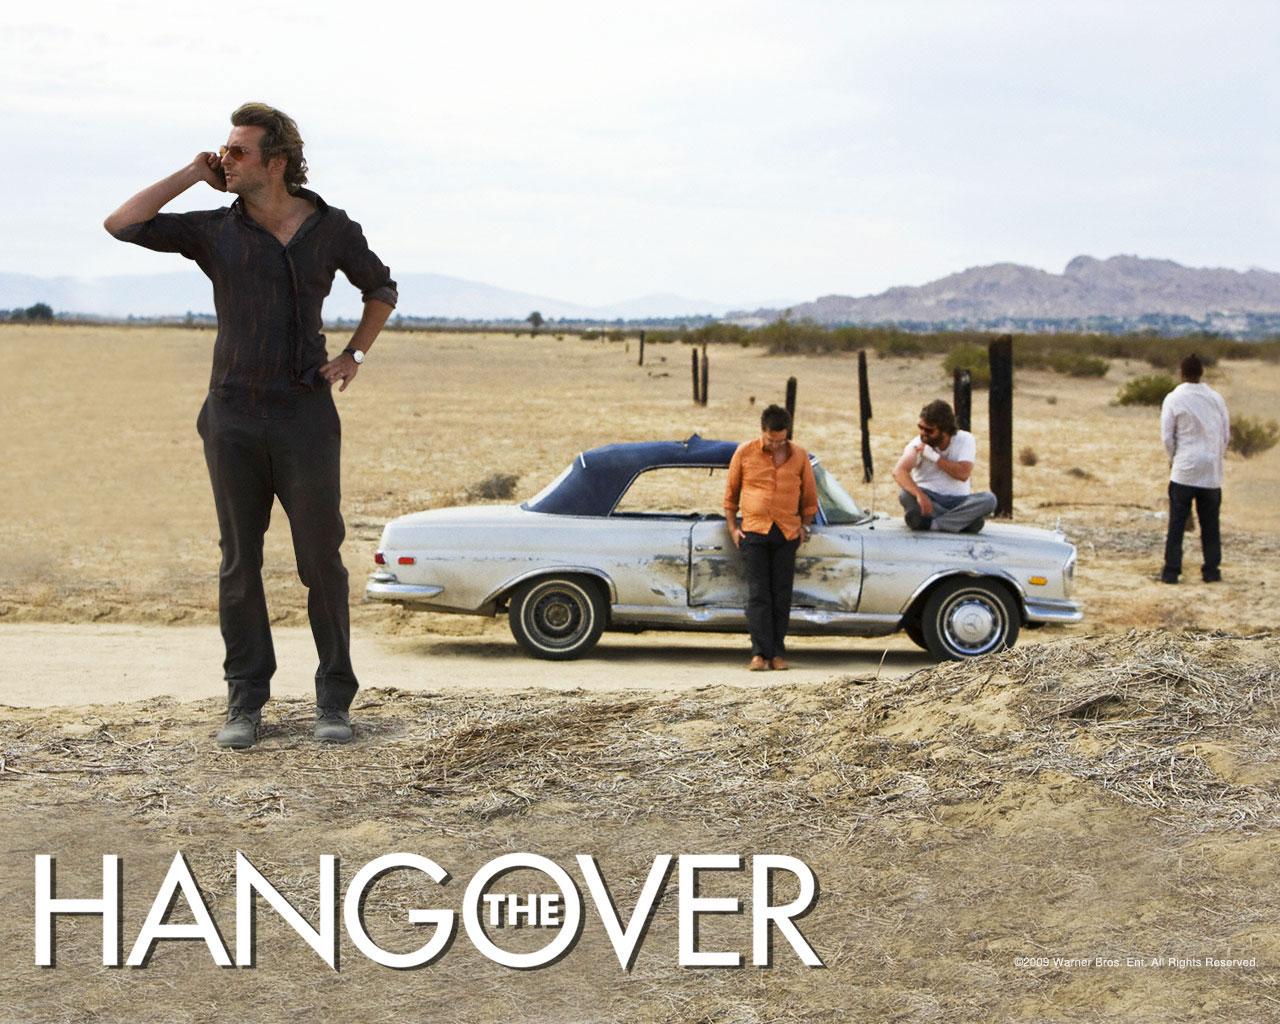 The Hangover 2 (¿Qué pasó ayer?)